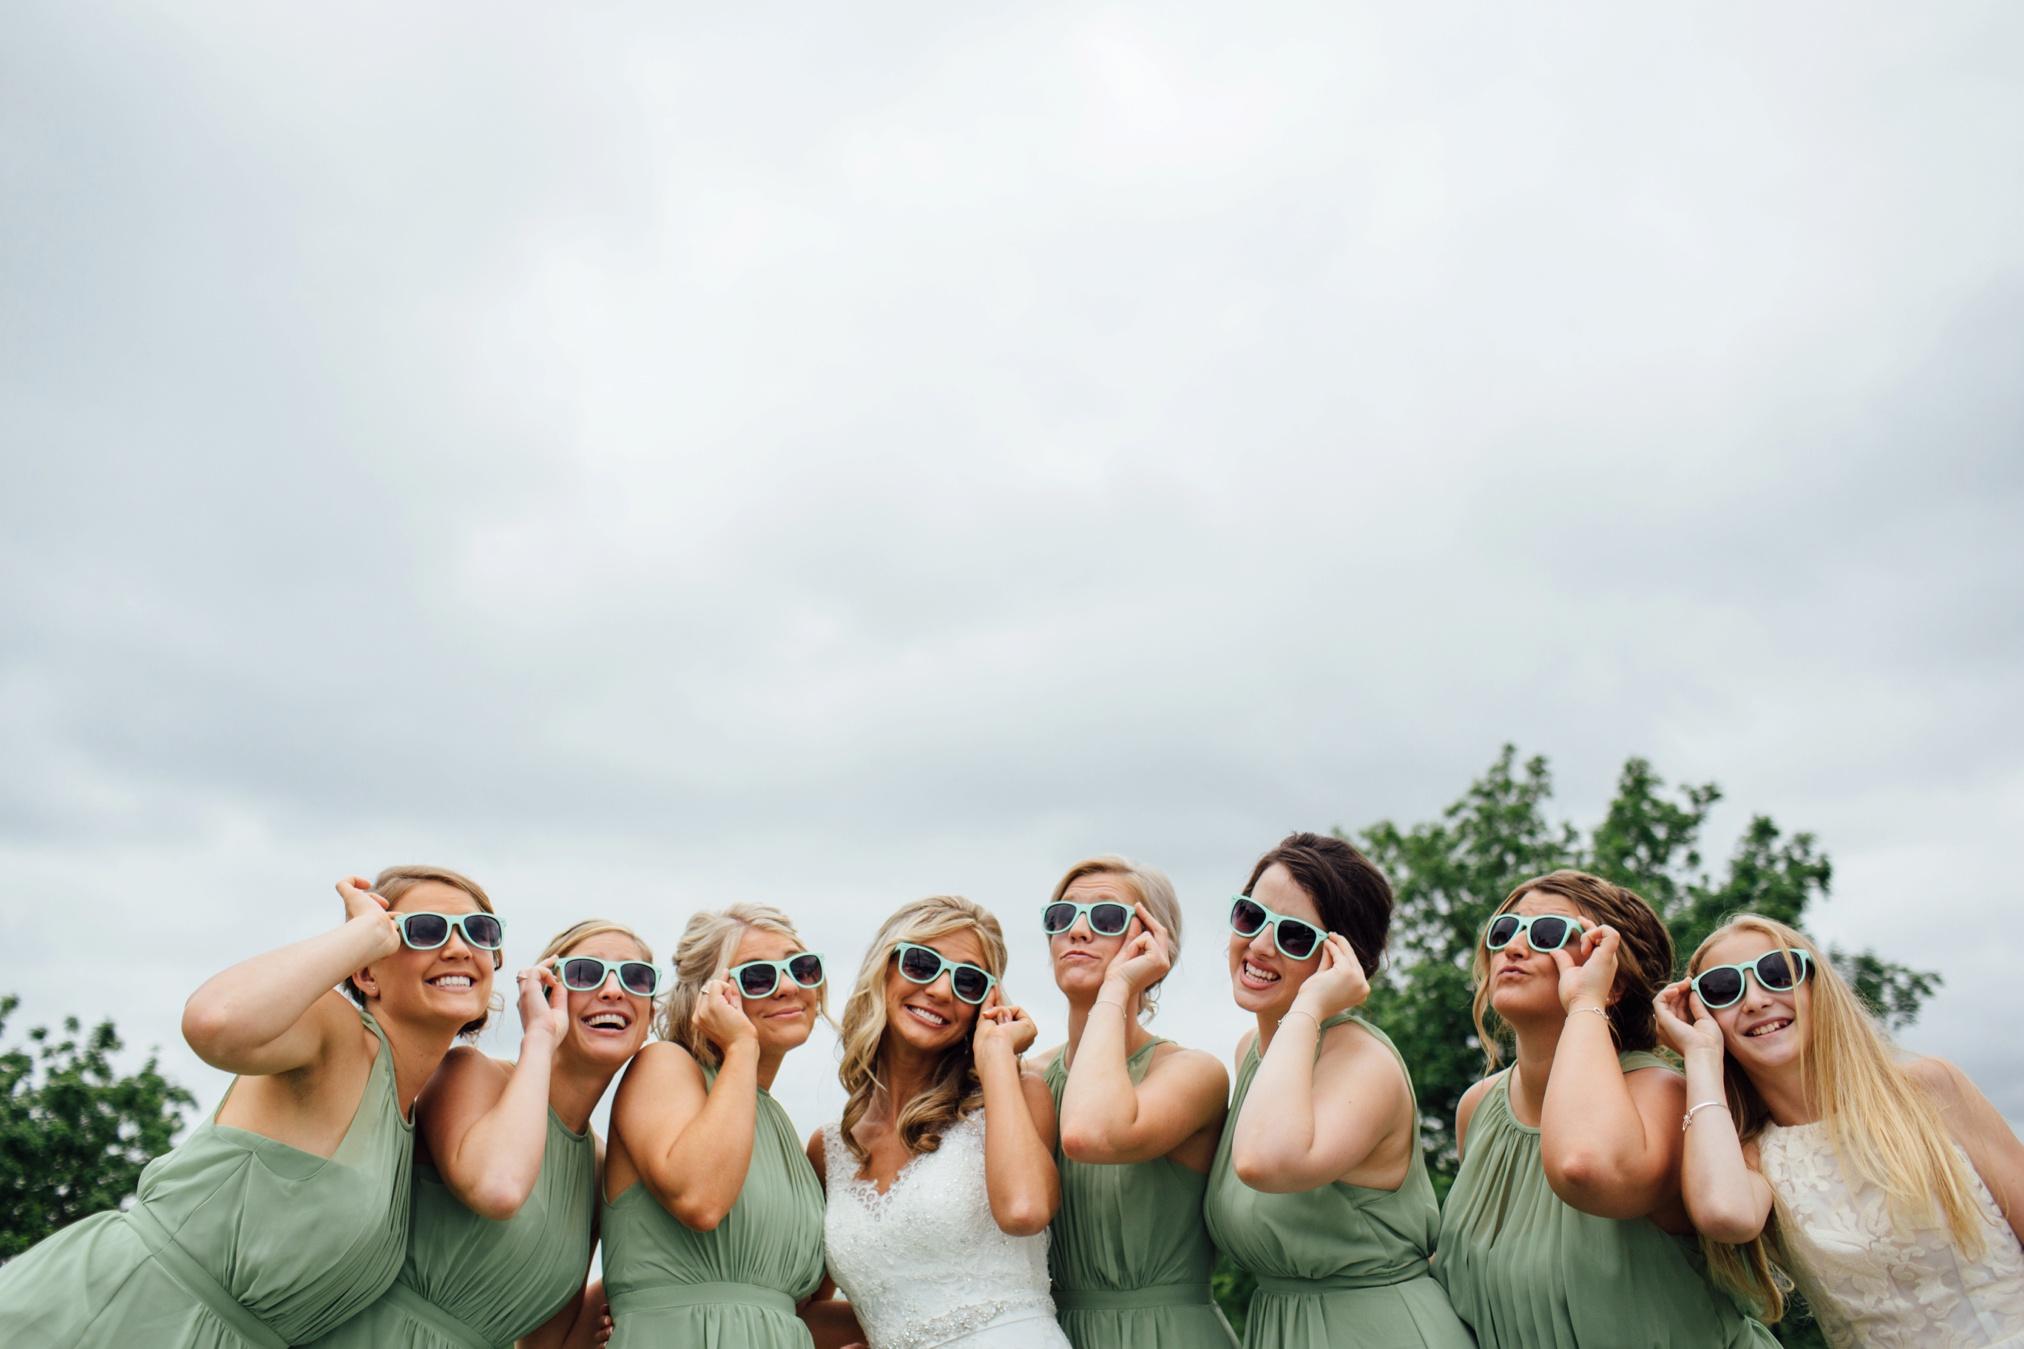 schmid_wedding-228.jpg